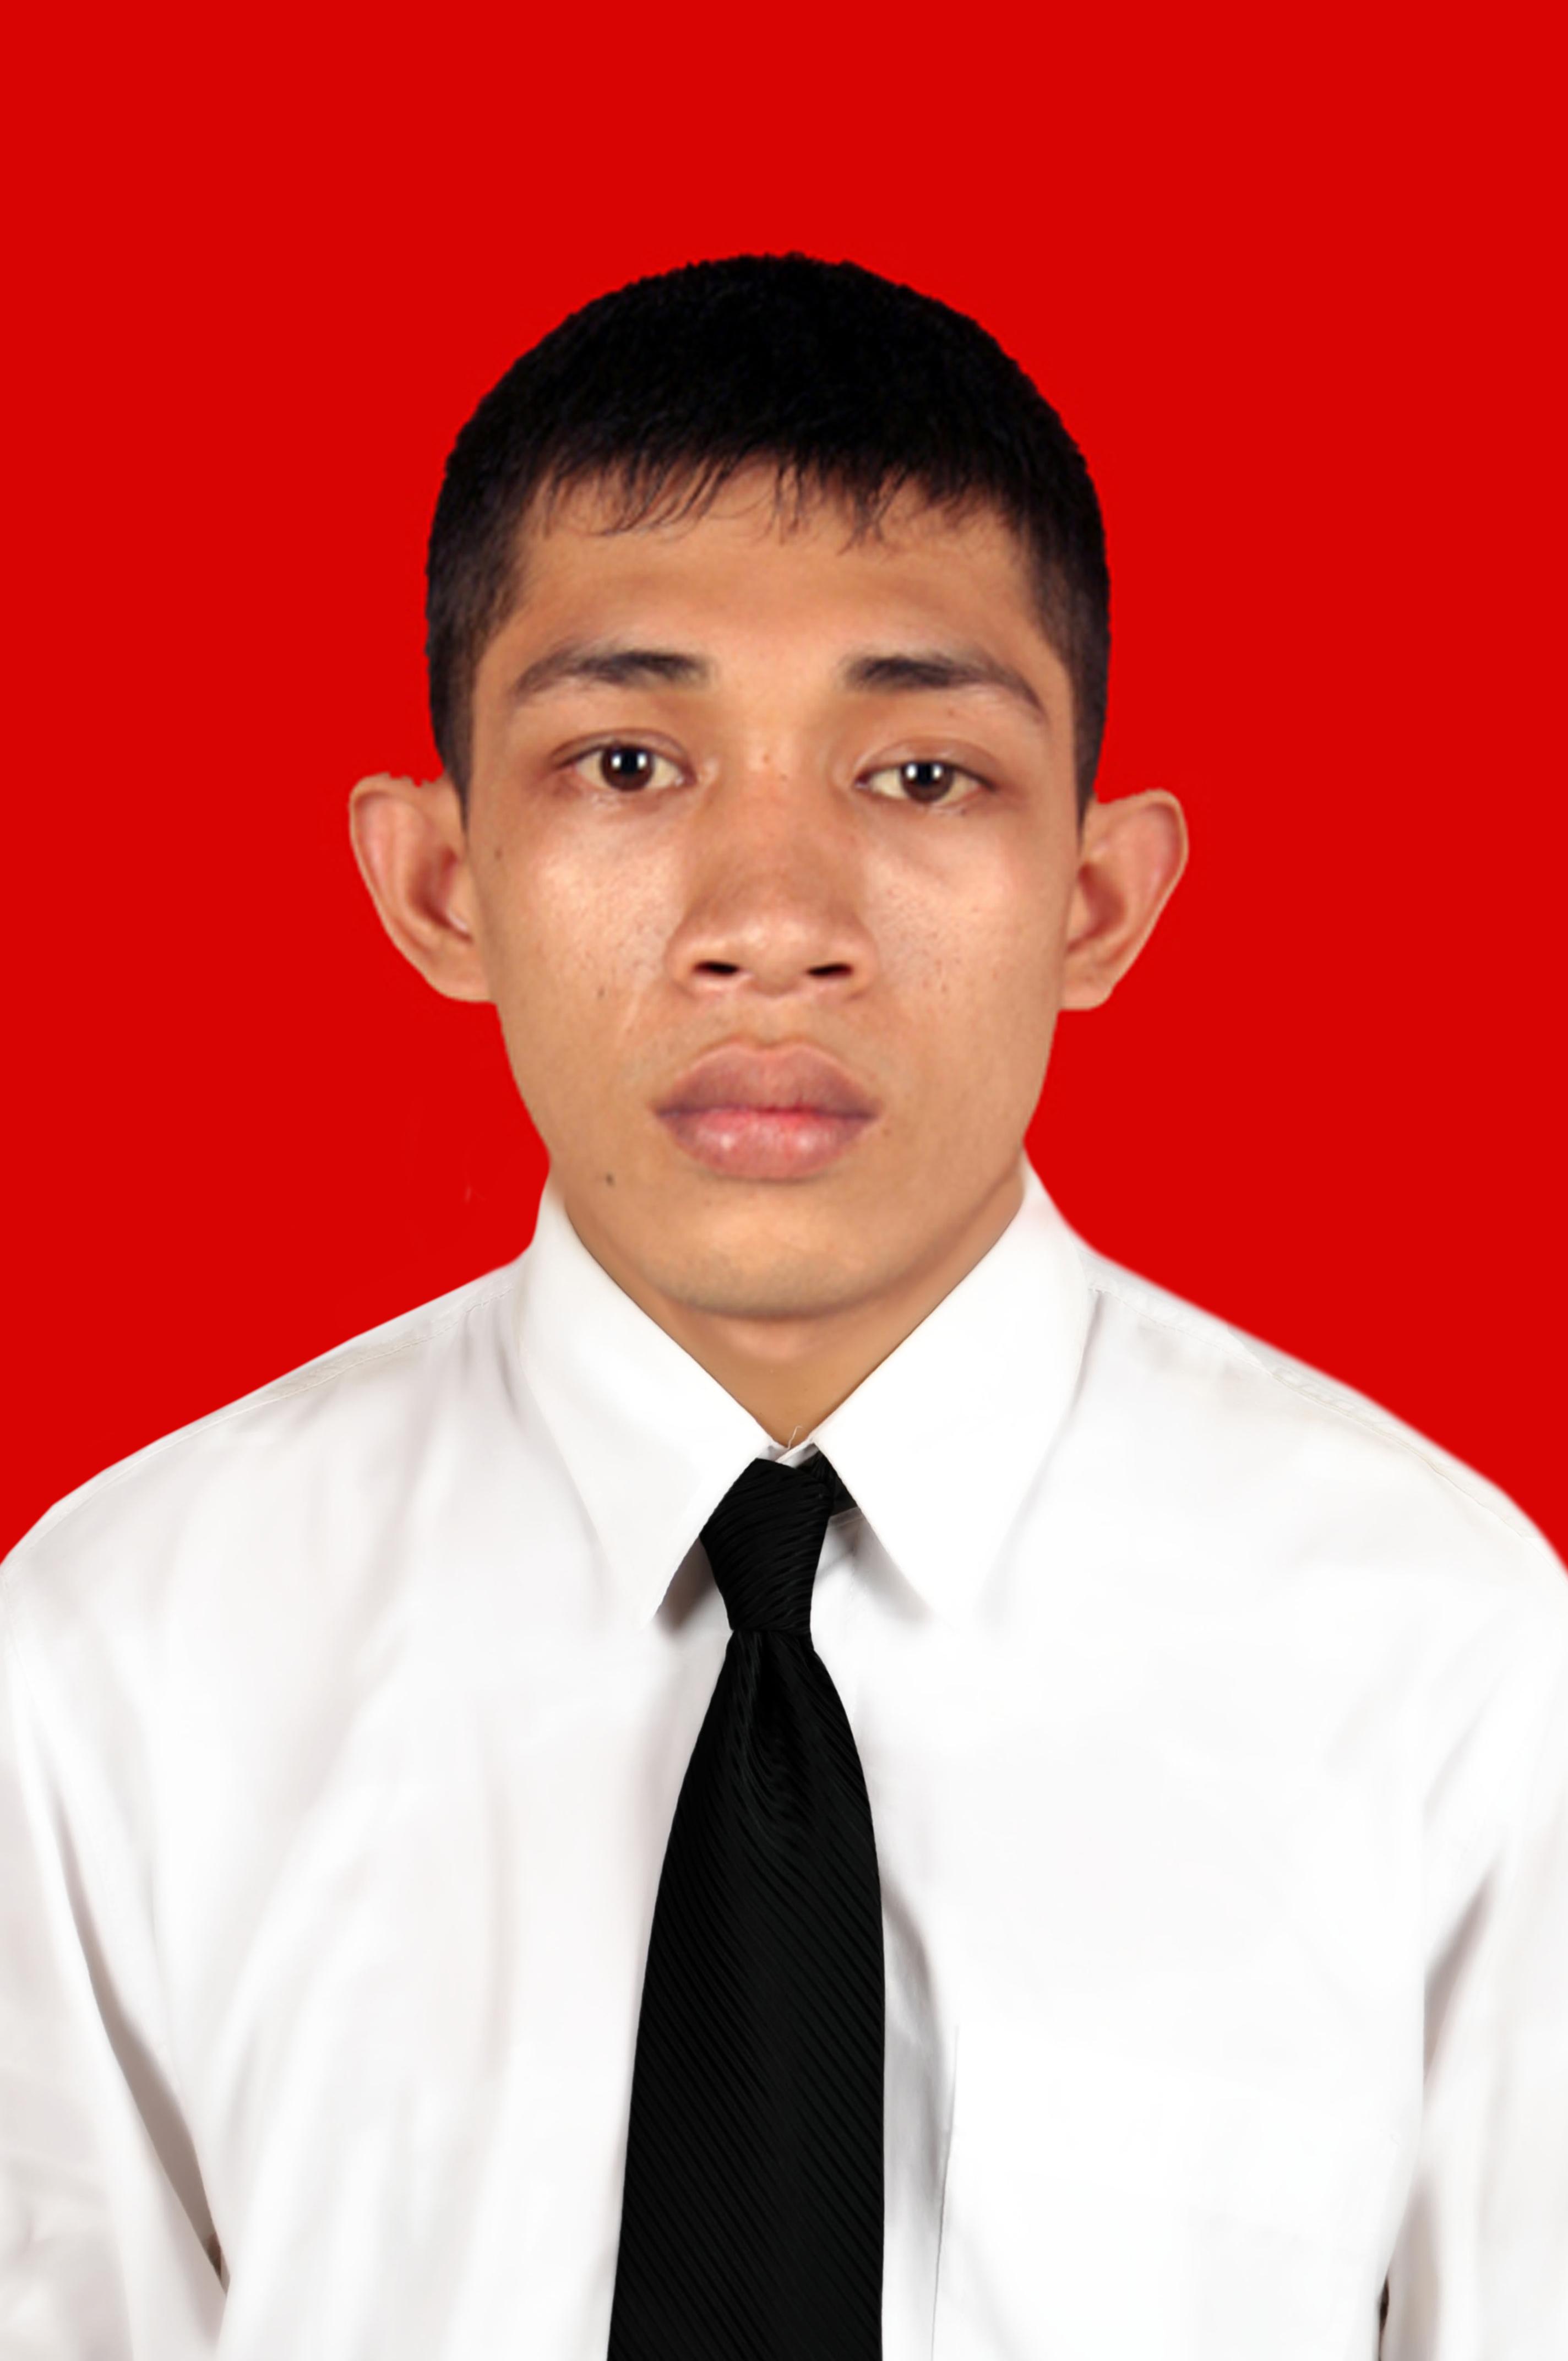 Harianto seafarer Third Engineer Oil/Chemical tanker